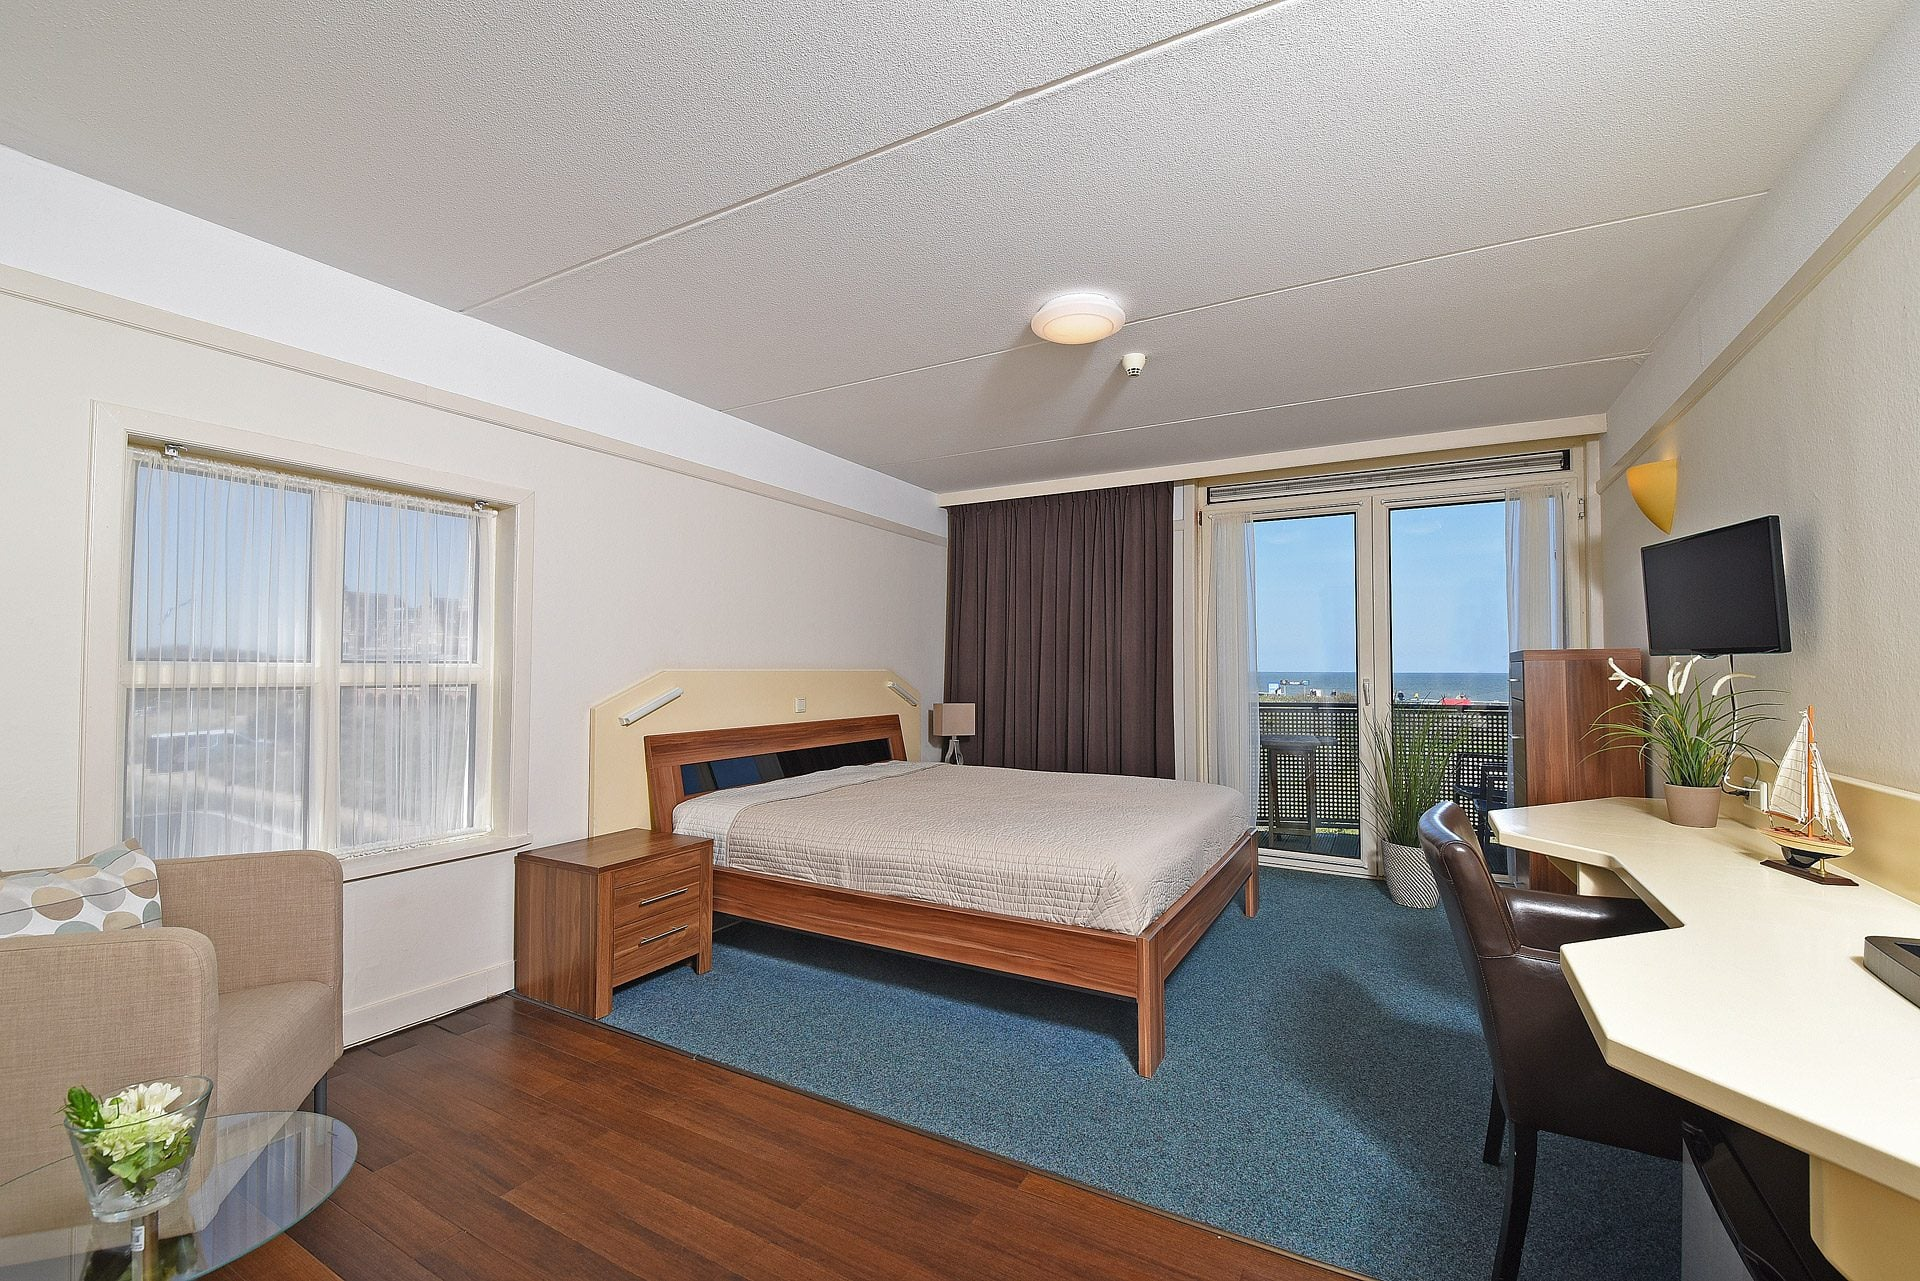 Rooms - Hotel Nehalennia